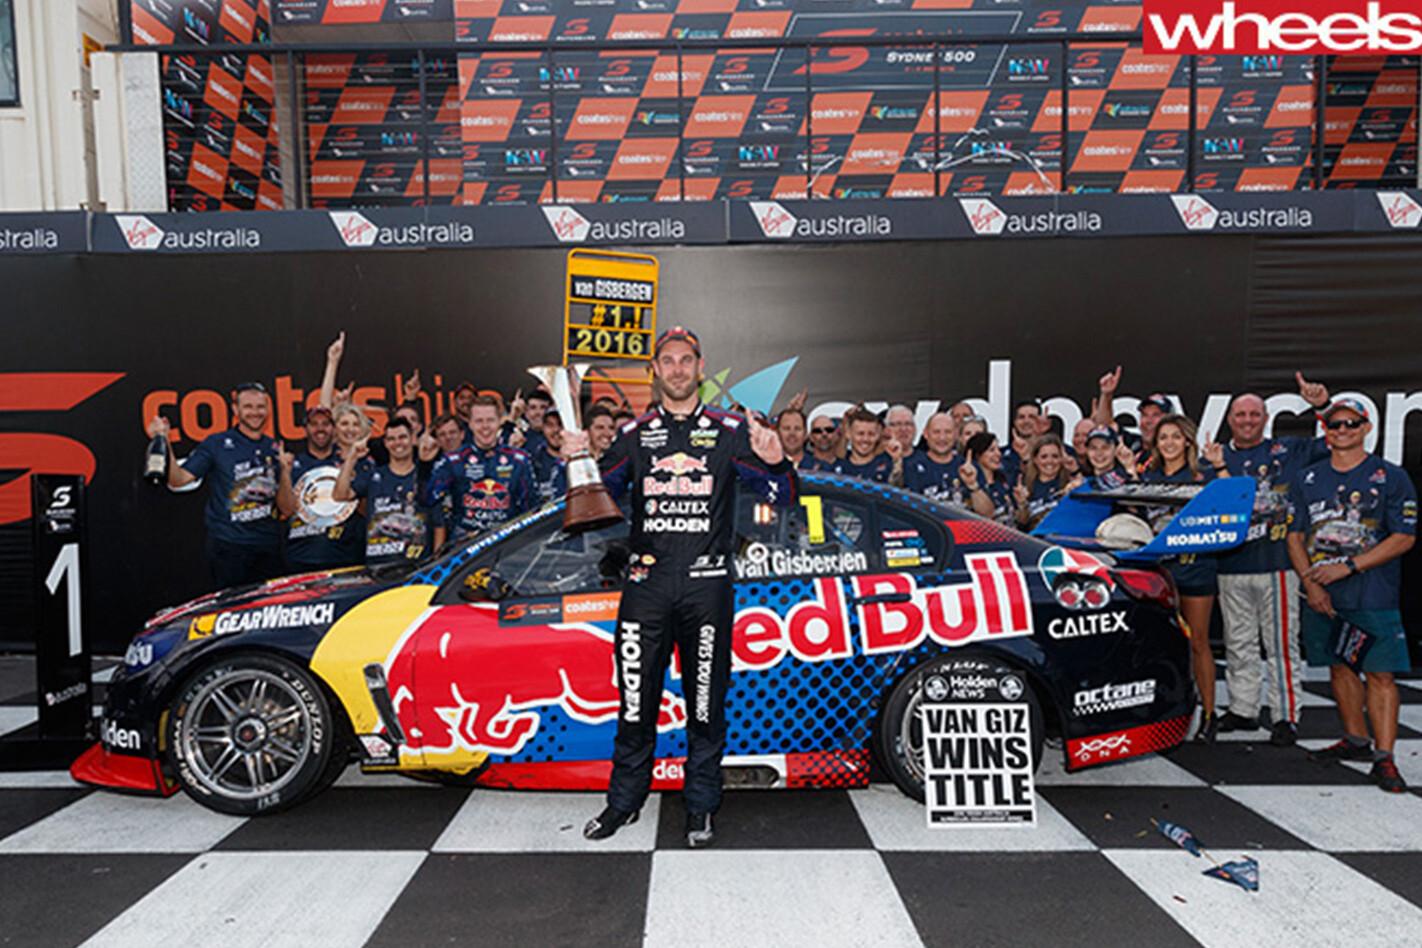 Van -Gisbergen -wins -2016-championship